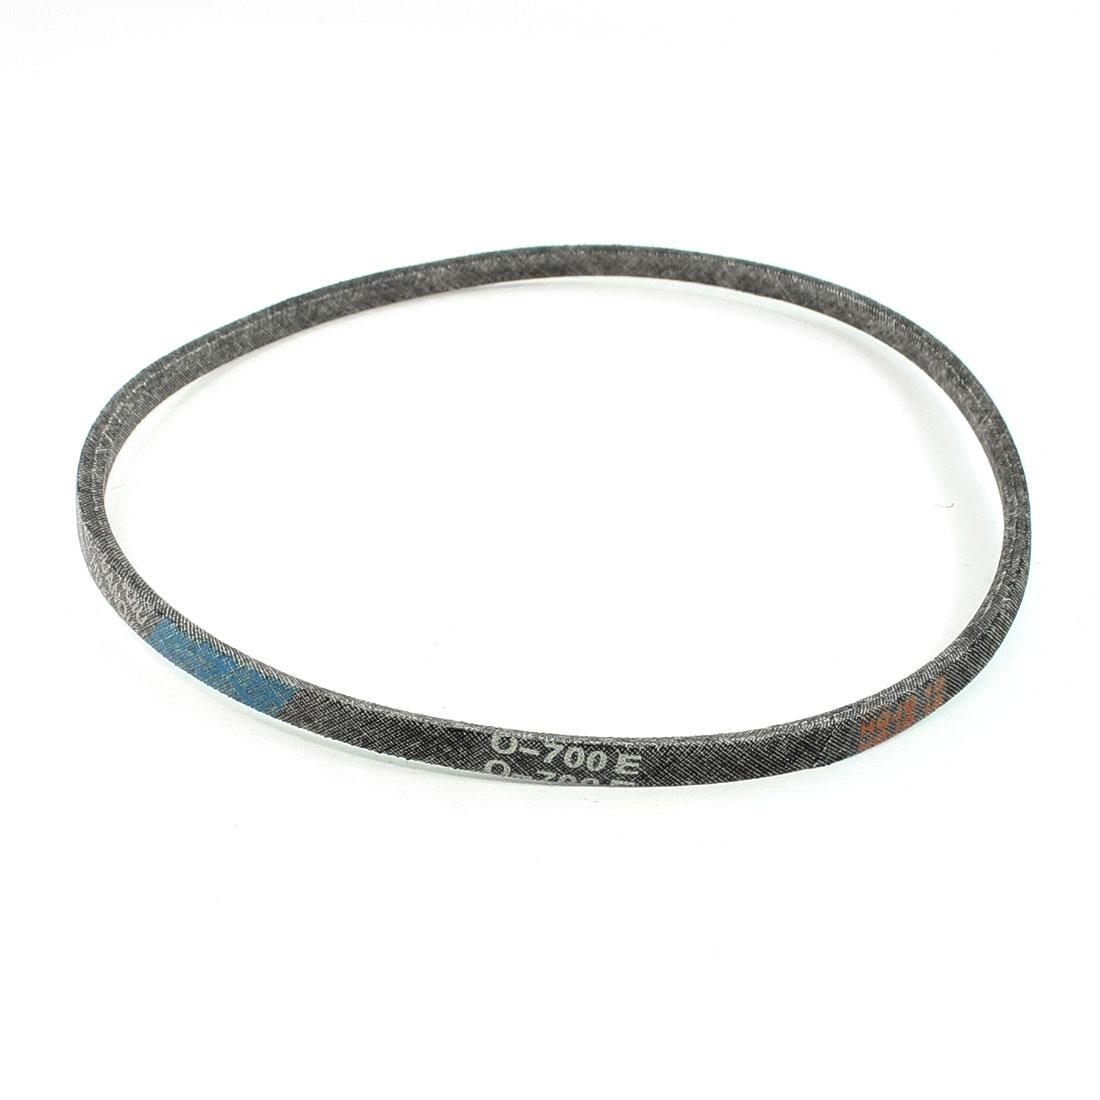 Black Washing Machine Motor O Type V Belt Fit Girth 700mm Thickness 6mm